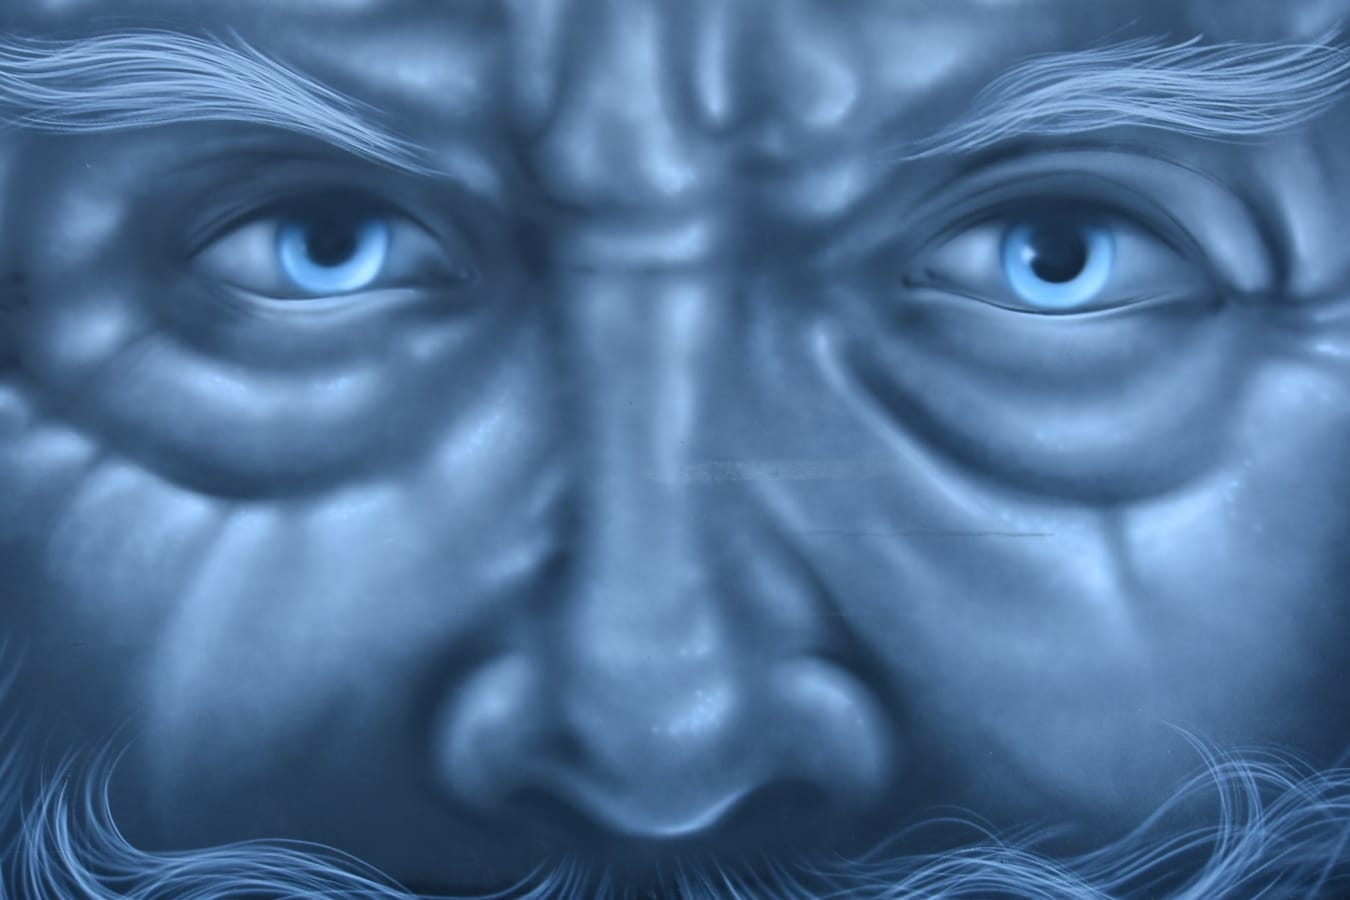 Alter Mann, Gesicht, Graffiti, Porträt, aus nächster Nähe, Blau, Augen, Kunst, Auge, abstrakt